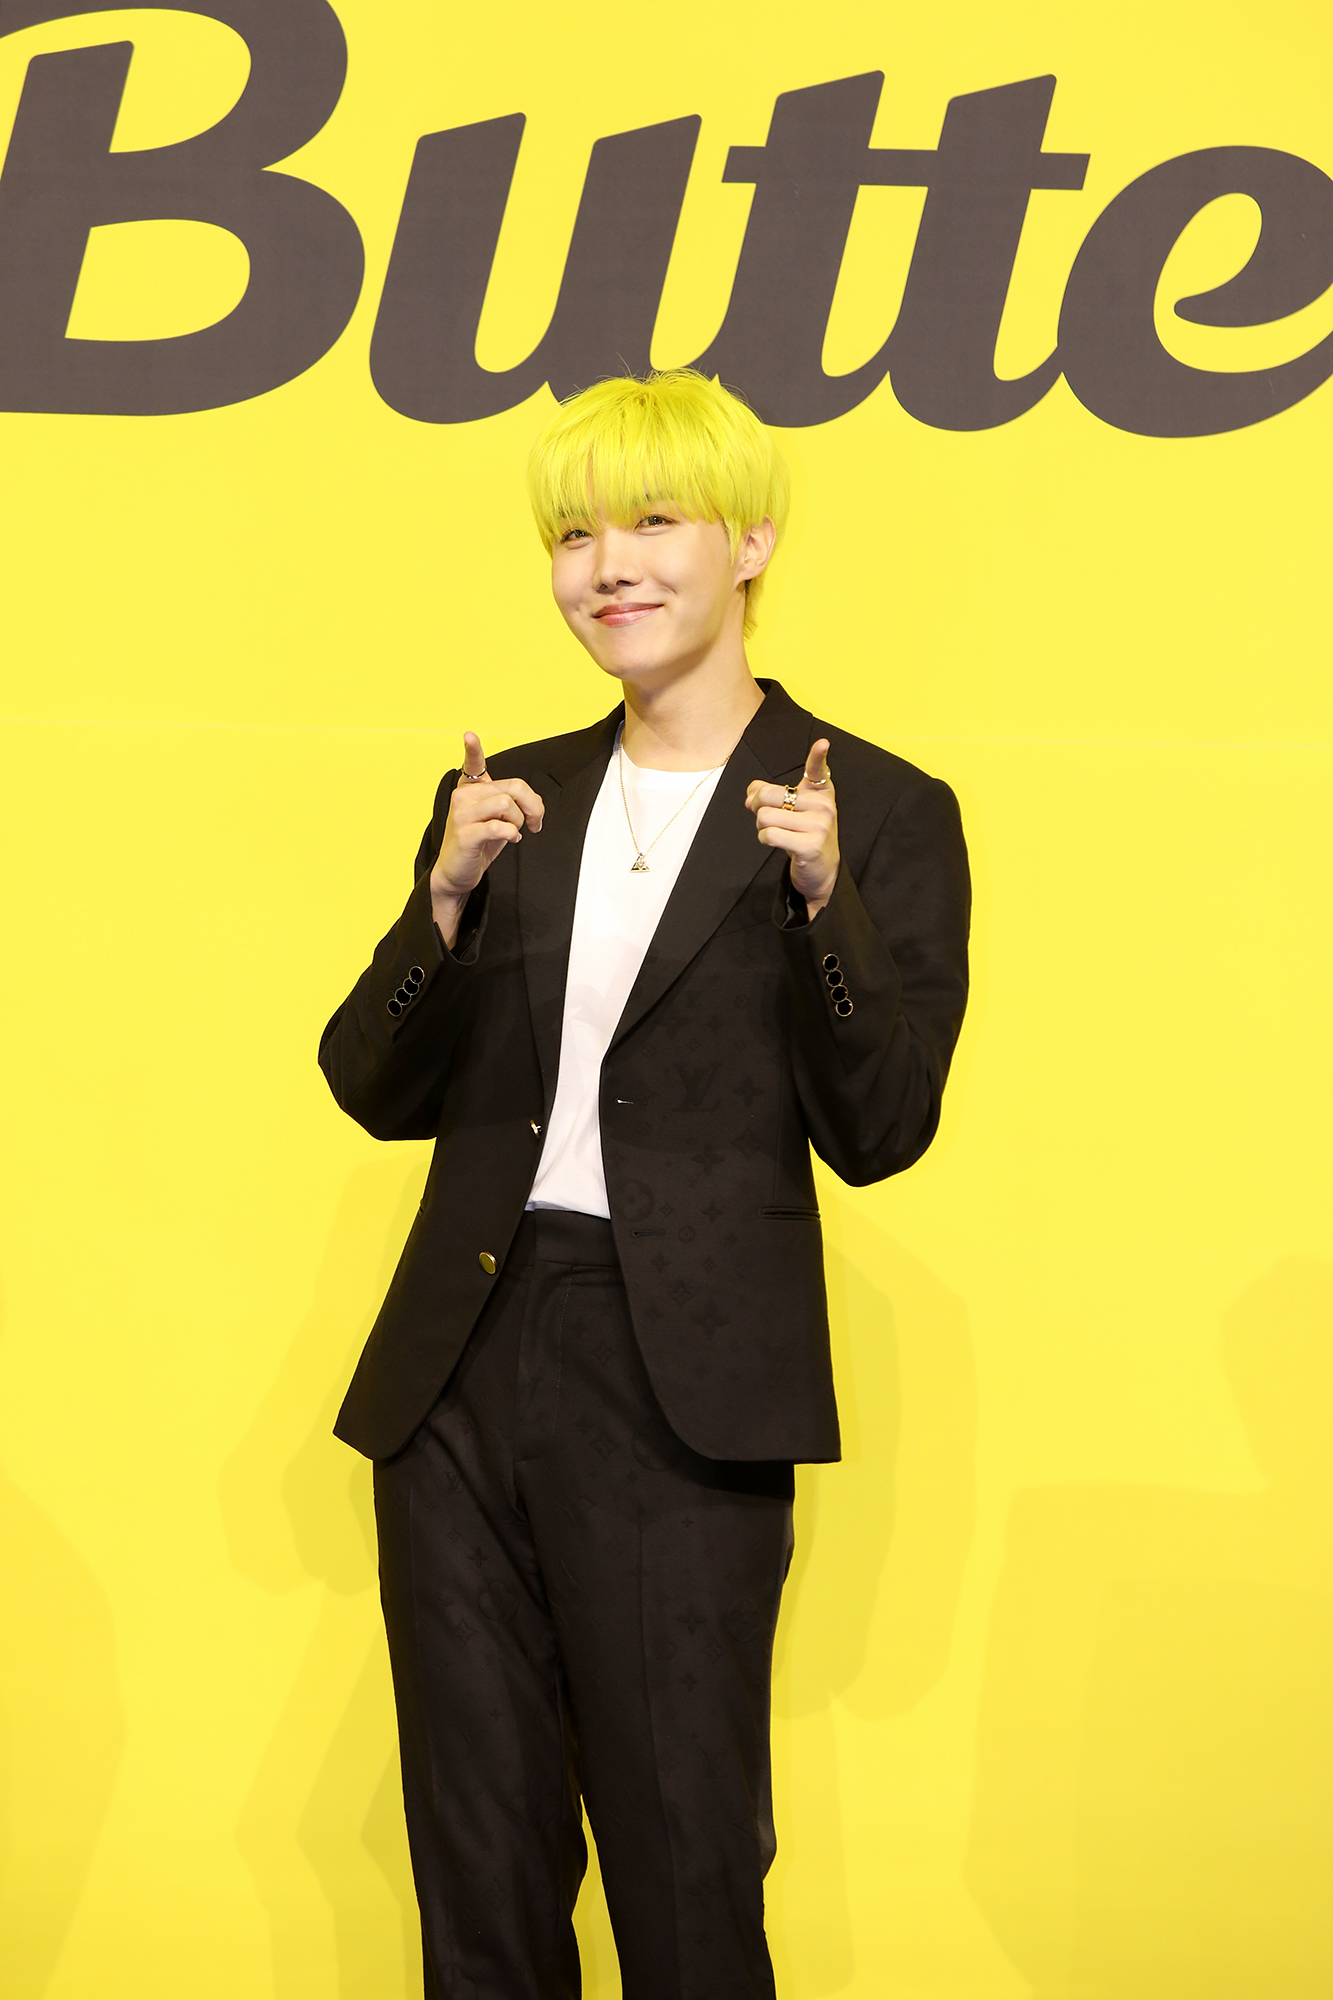 BTS Butter J-HOPE オンライン記者会見